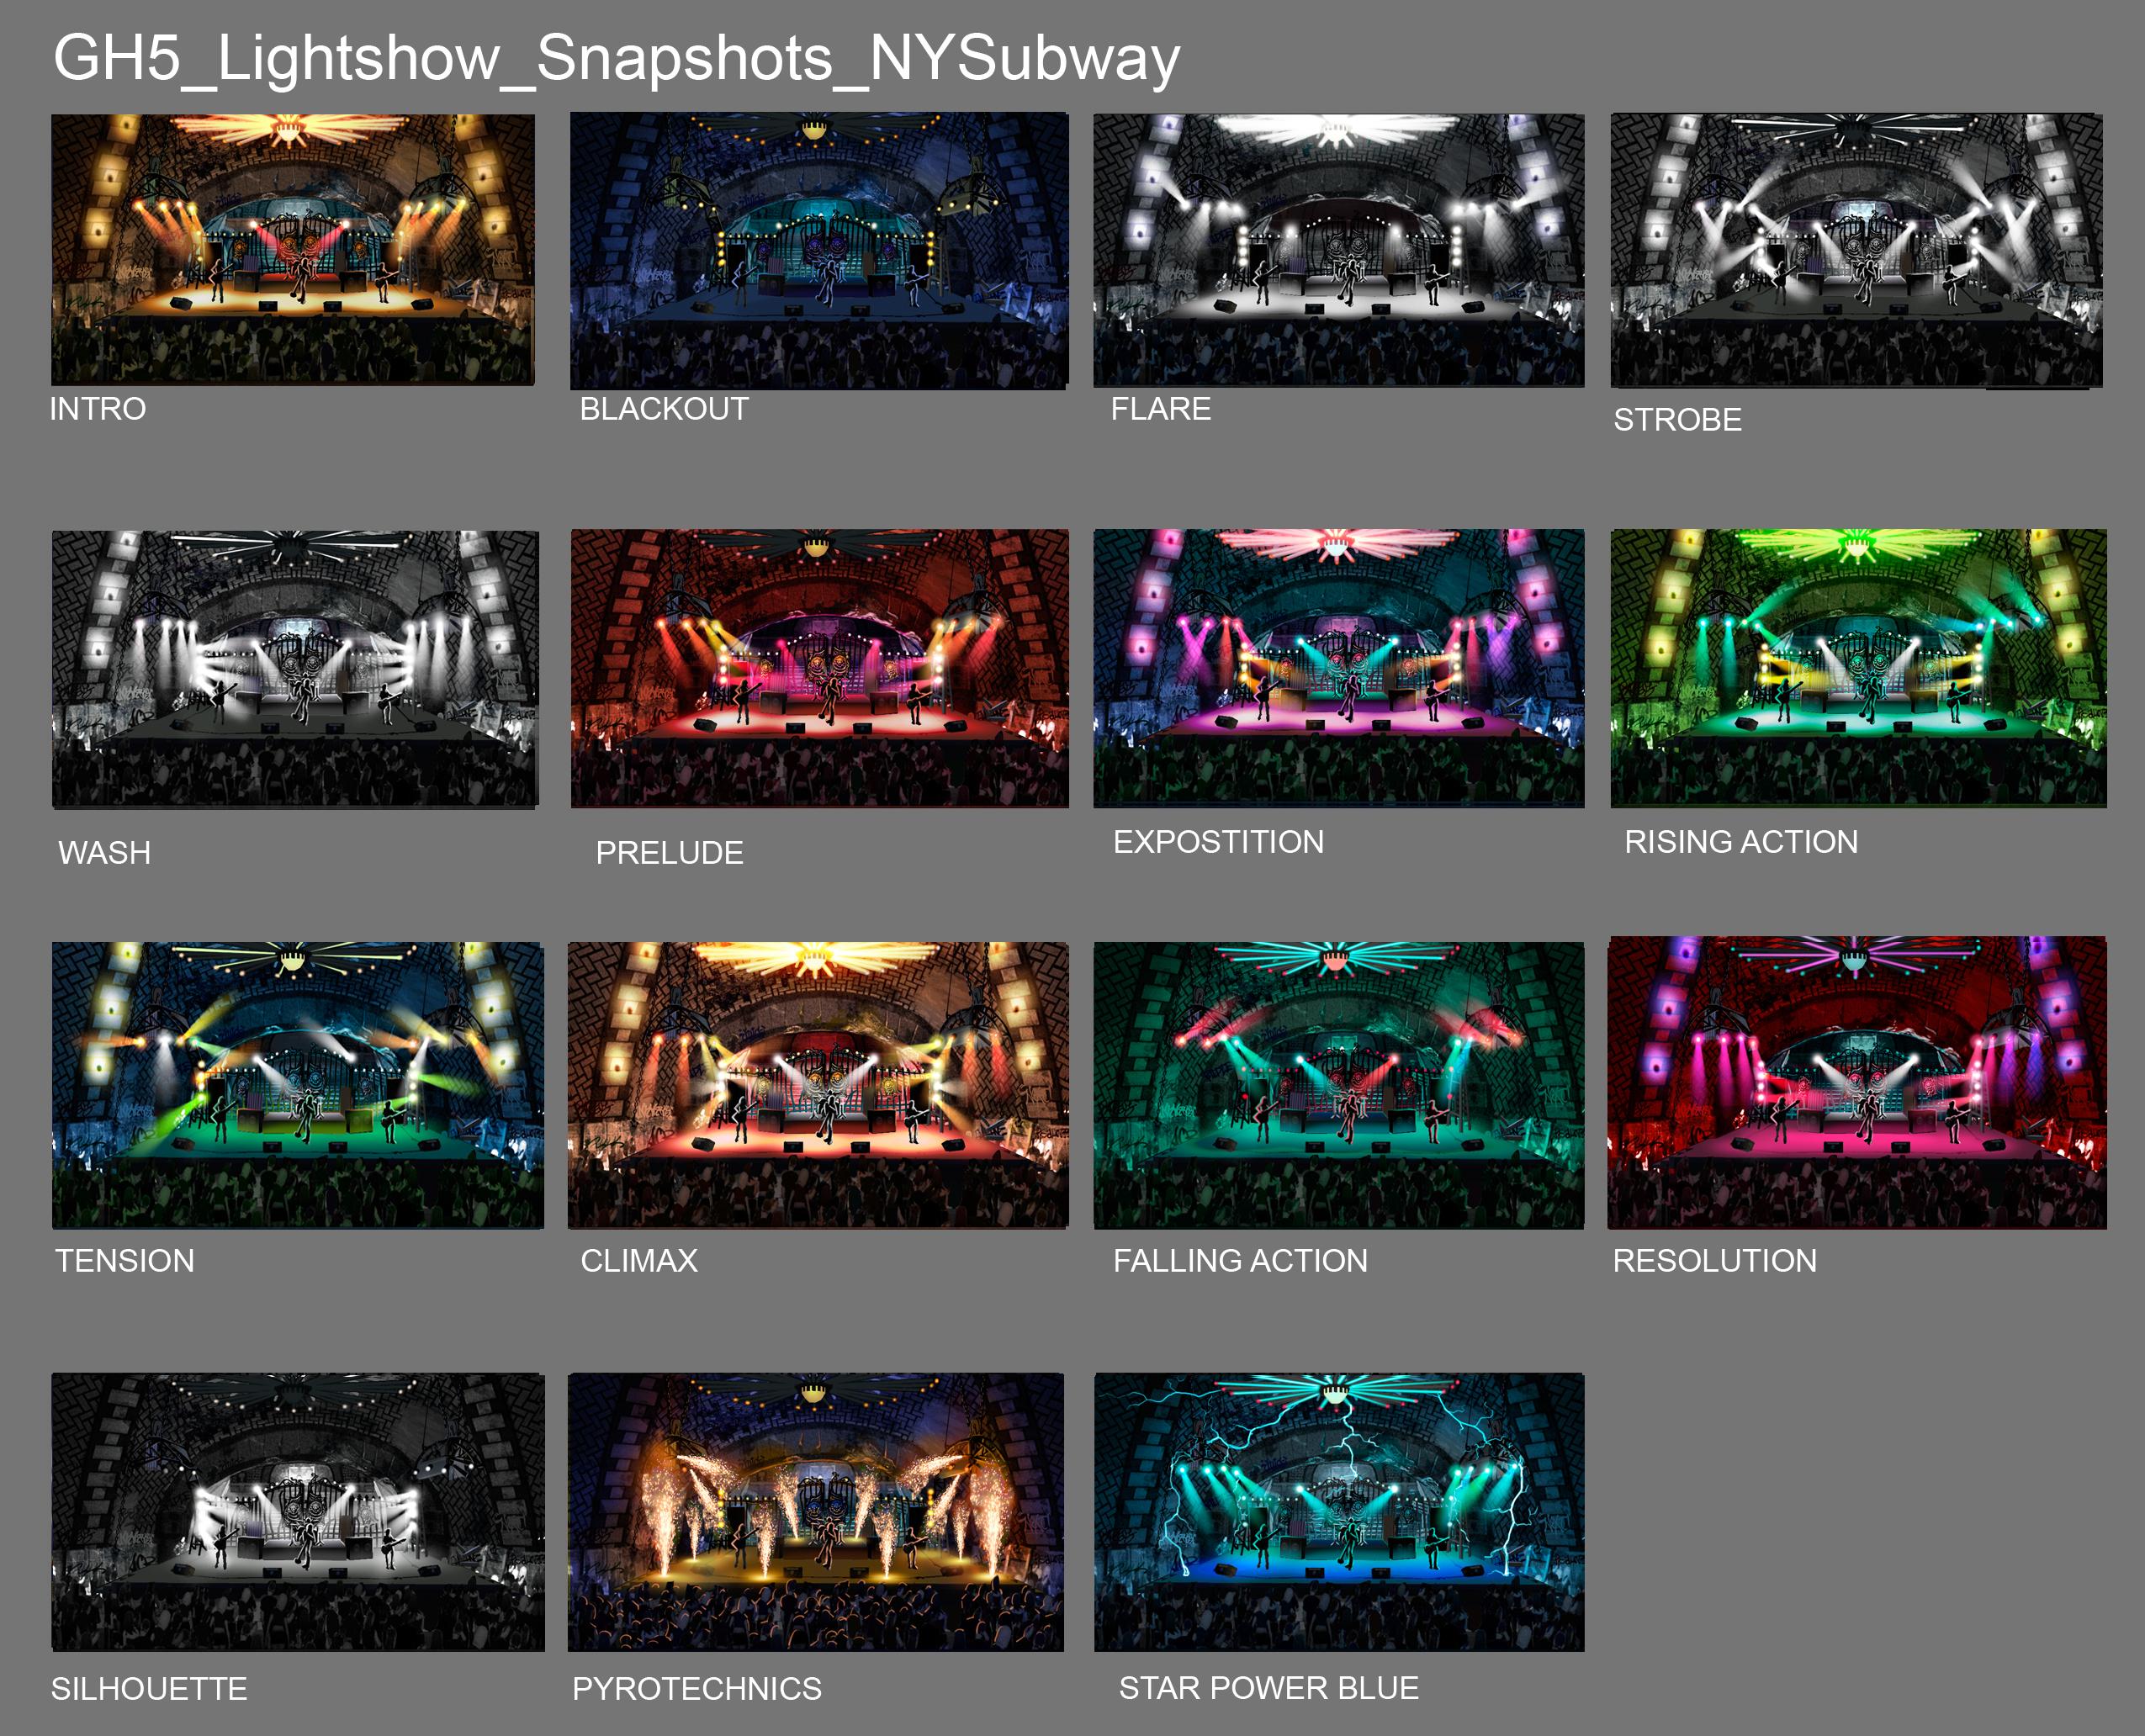 NYSubway_Lightshow_Snapshots_01